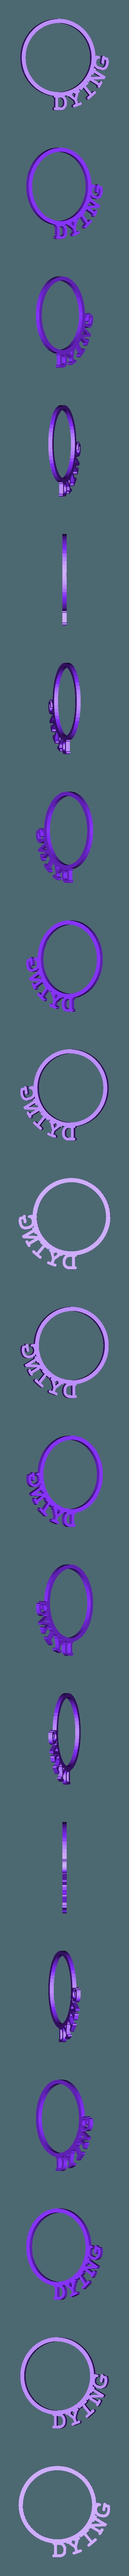 LRingDying.stl Download STL file D&D Condition Rings • 3D printable design, Jinja